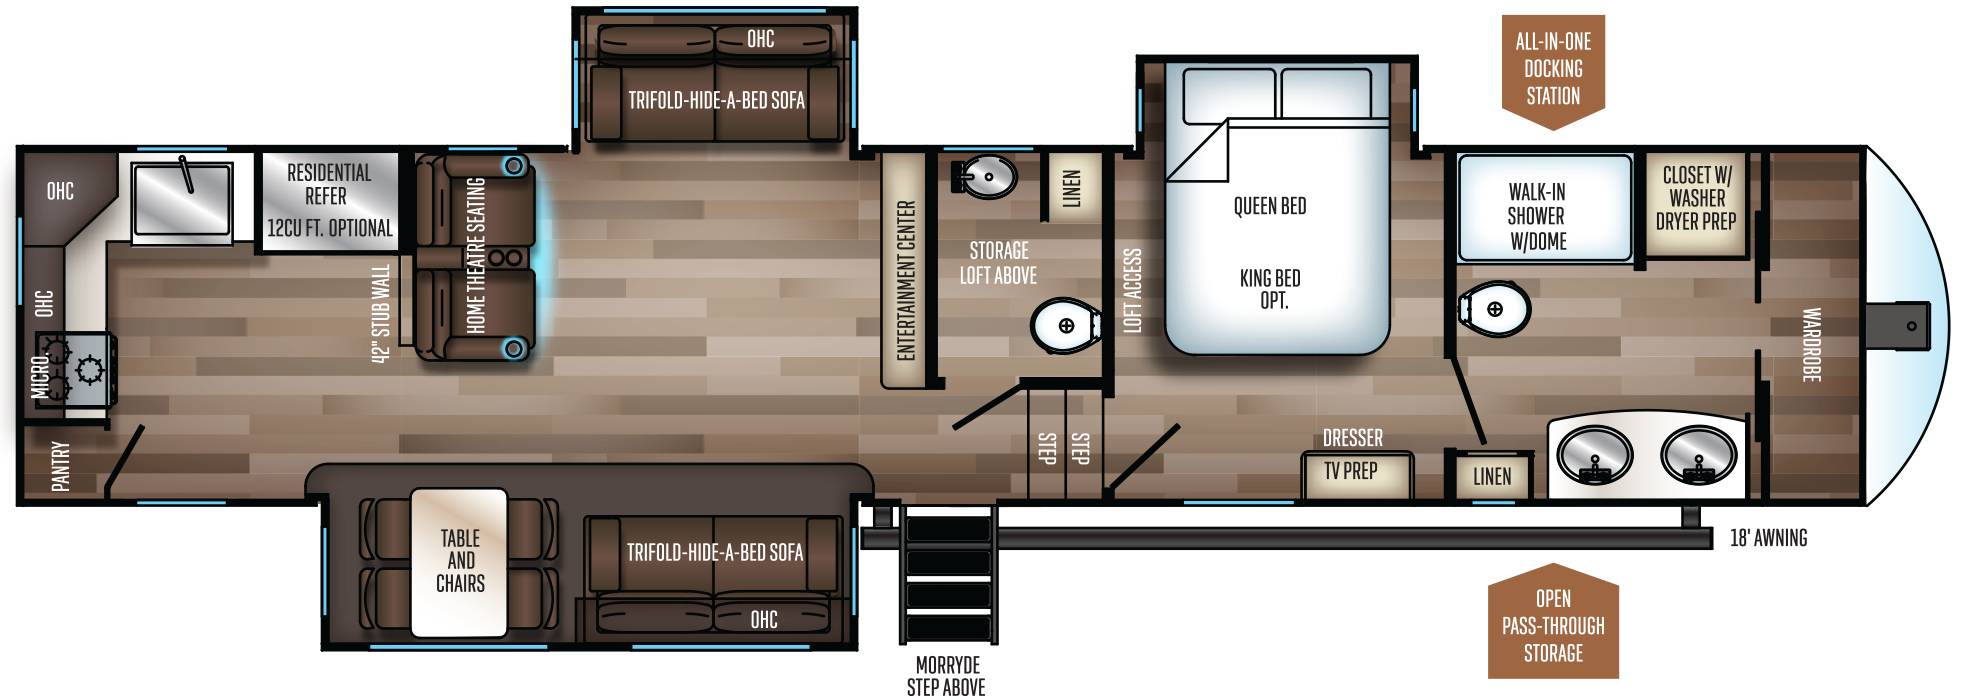 37fbt Floorplan